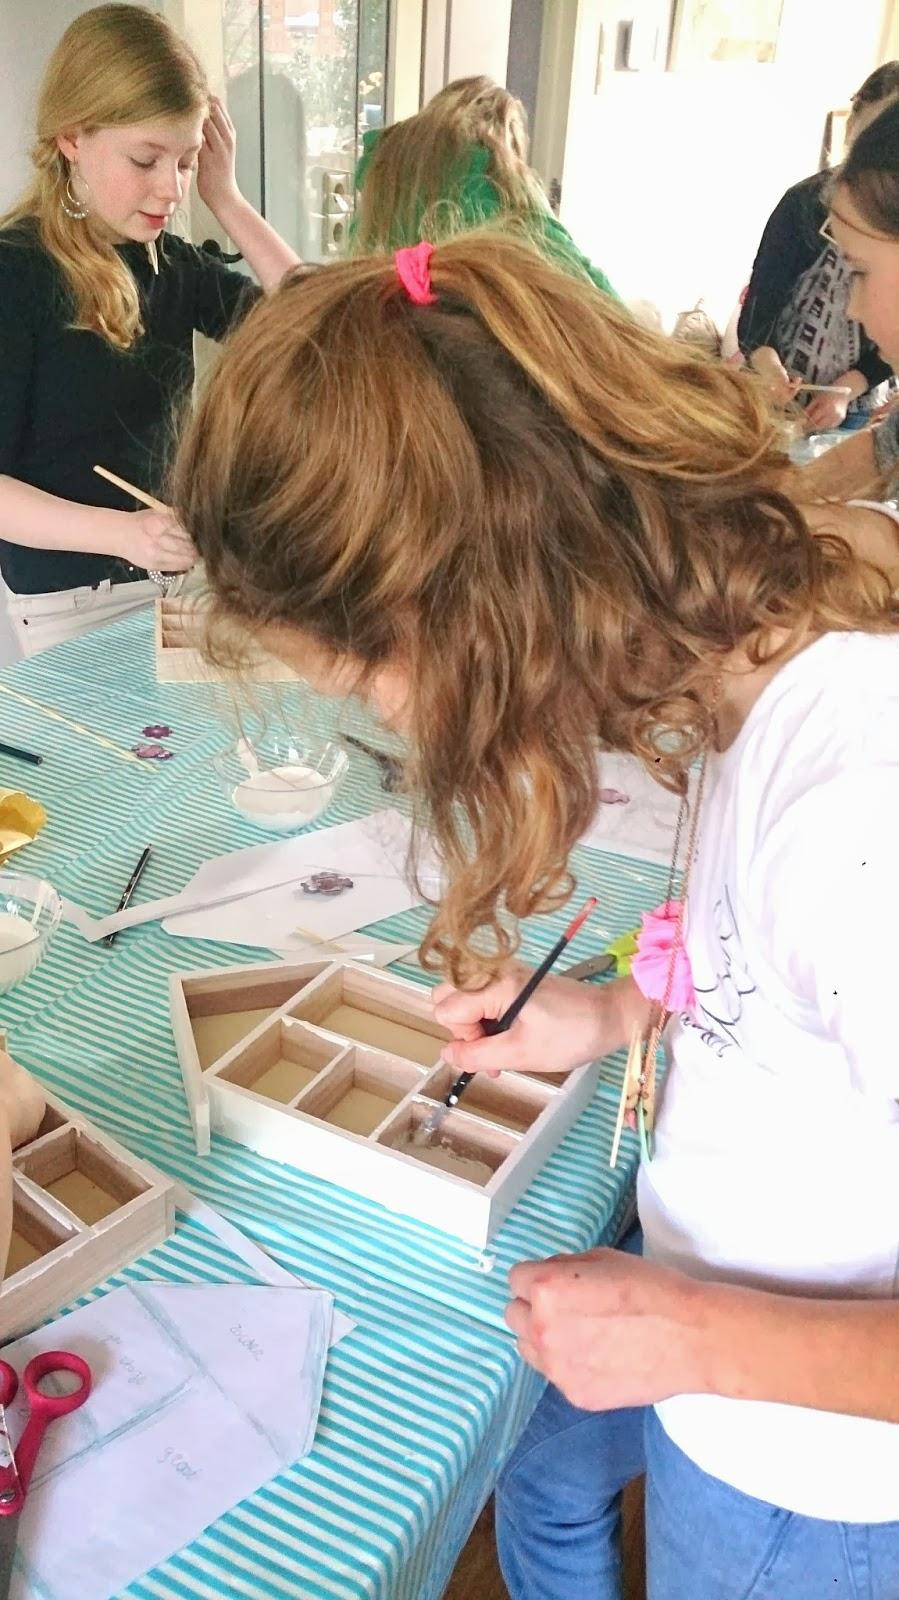 Collie-Collie: Workshop letterbak versieren op Bridget's kinderfeestje